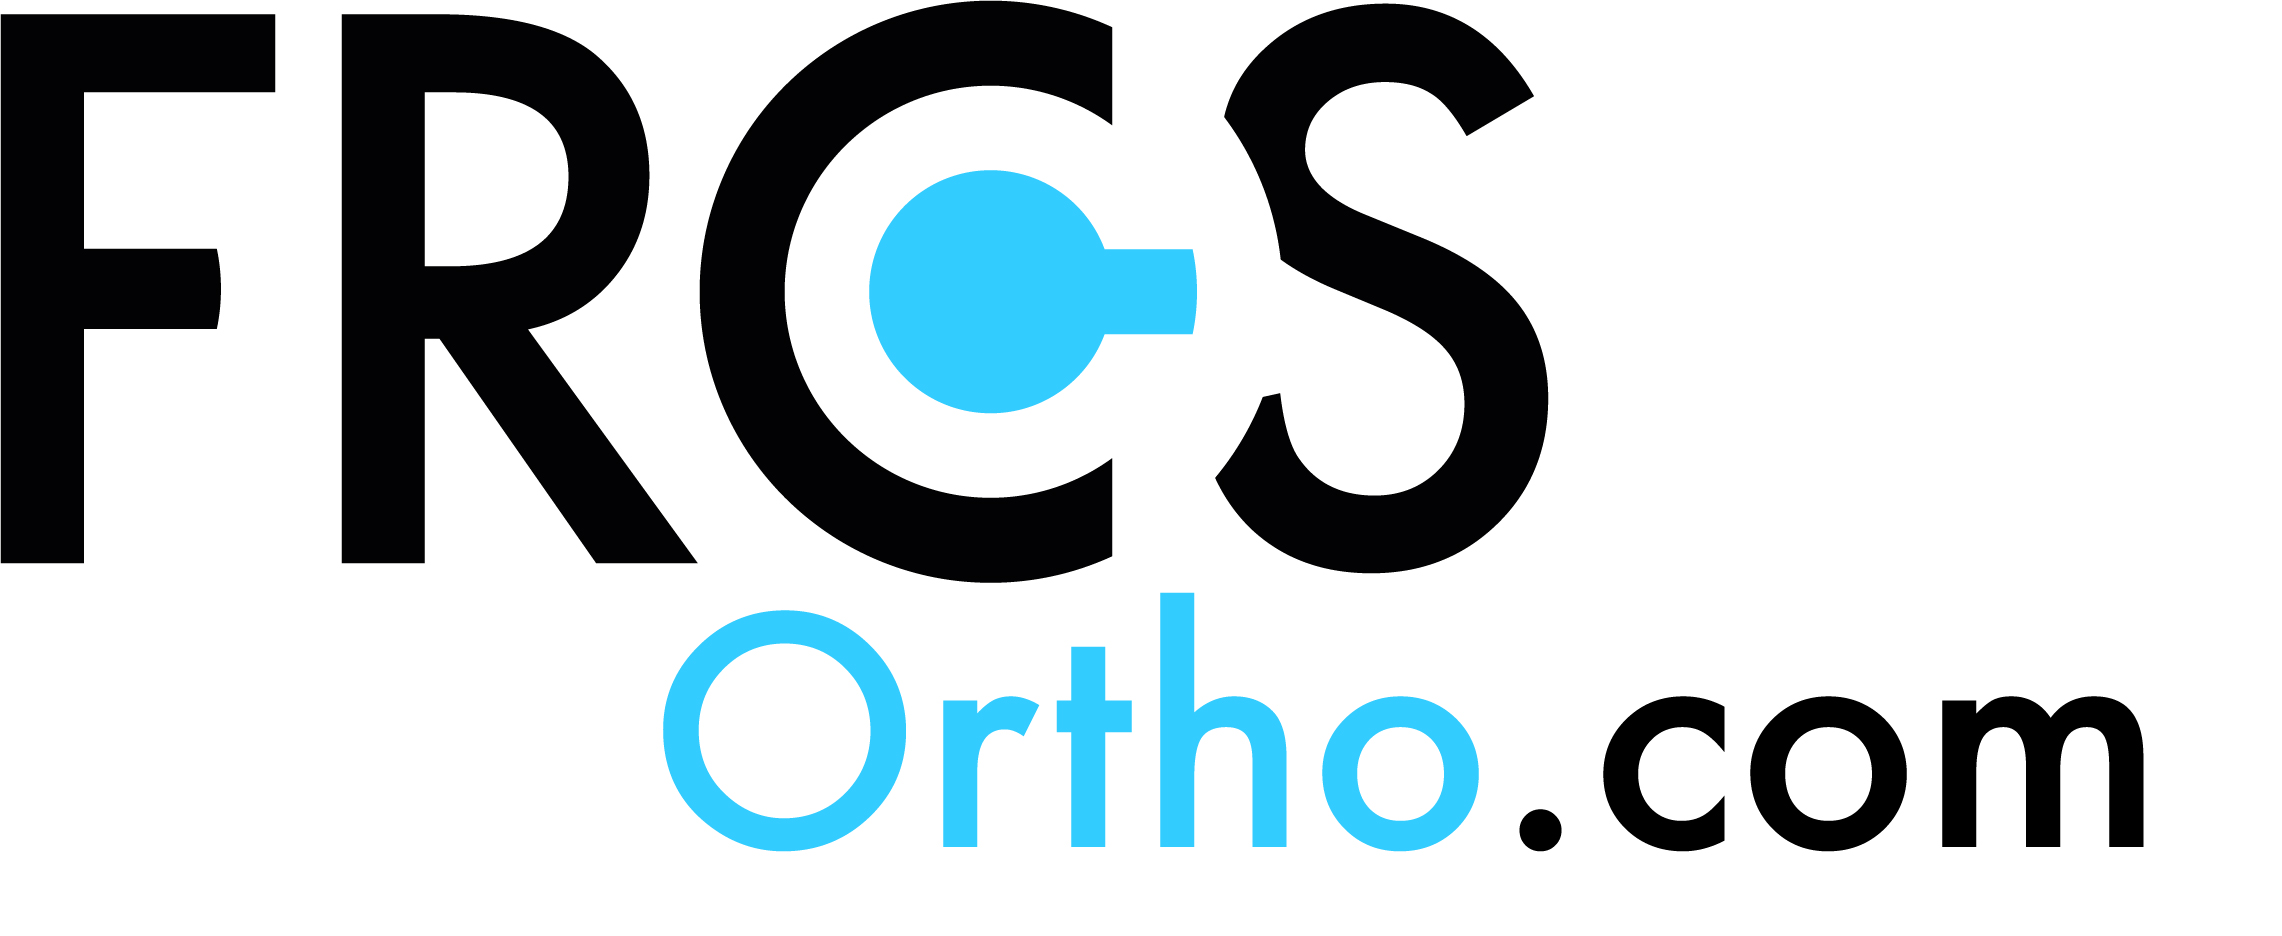 FRCS Tr & Orth Questions